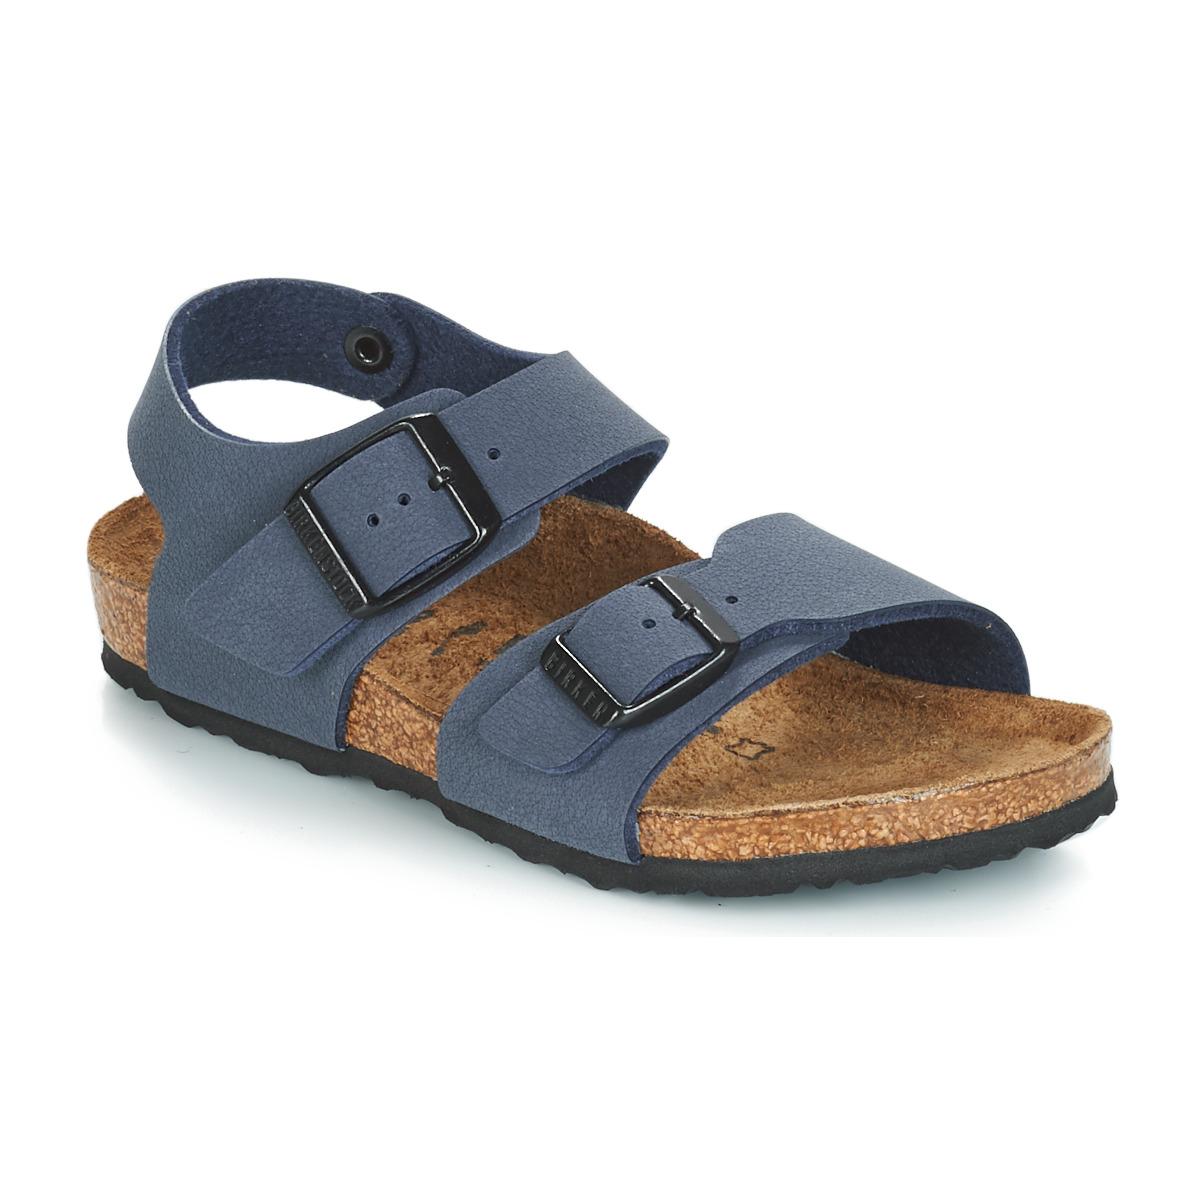 Sandale Birkenstock NEW YORK Bleu